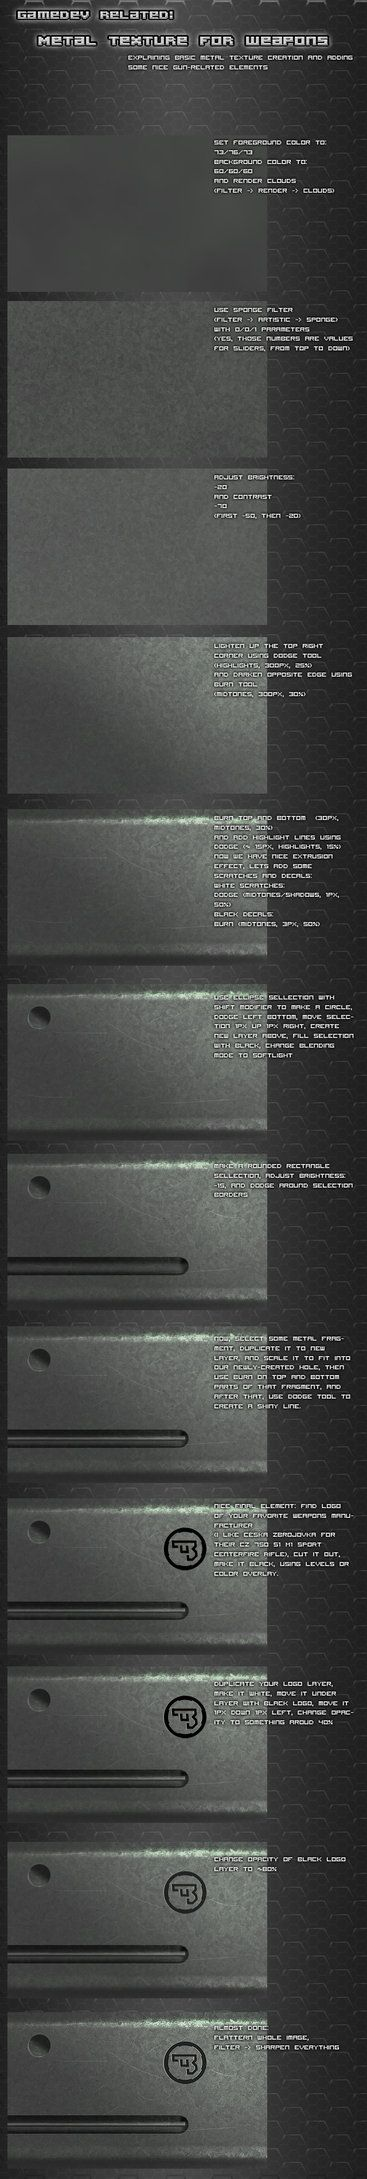 Metal texture tutorial by Pirosan on deviantART